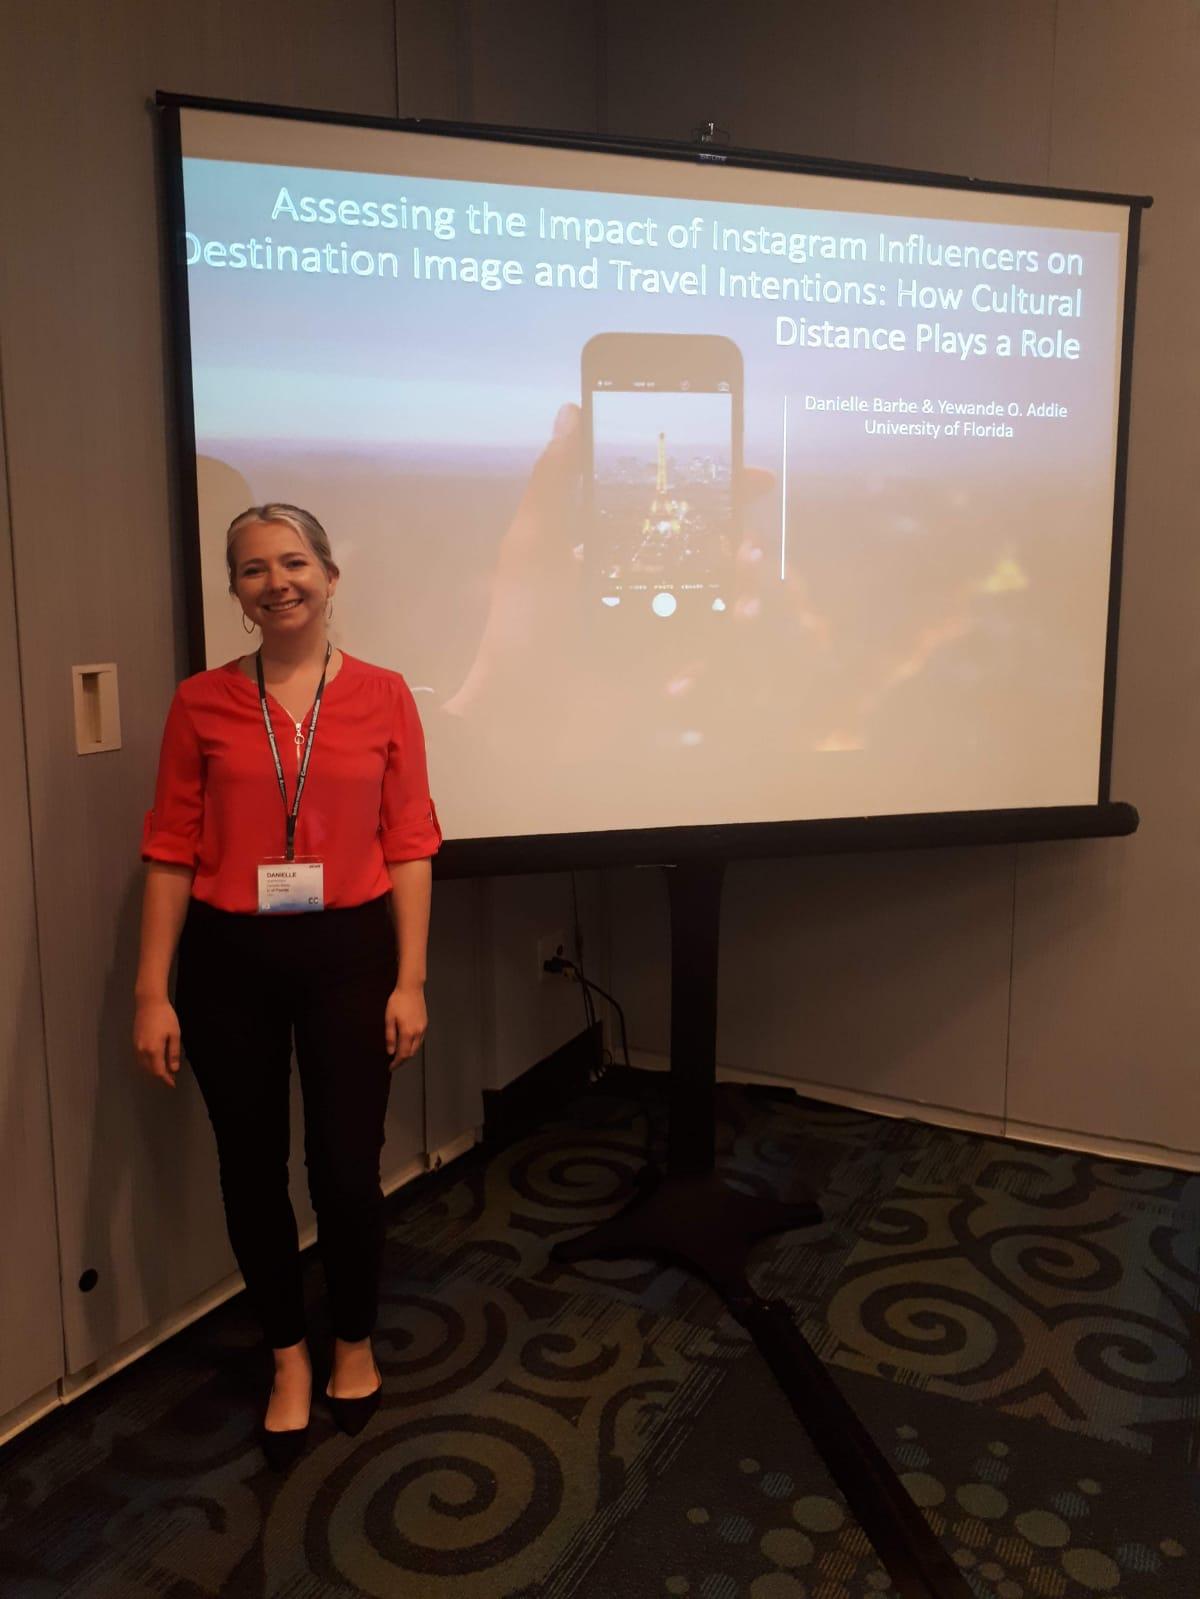 International Communication Association conference. May 2019. Washington, DC.